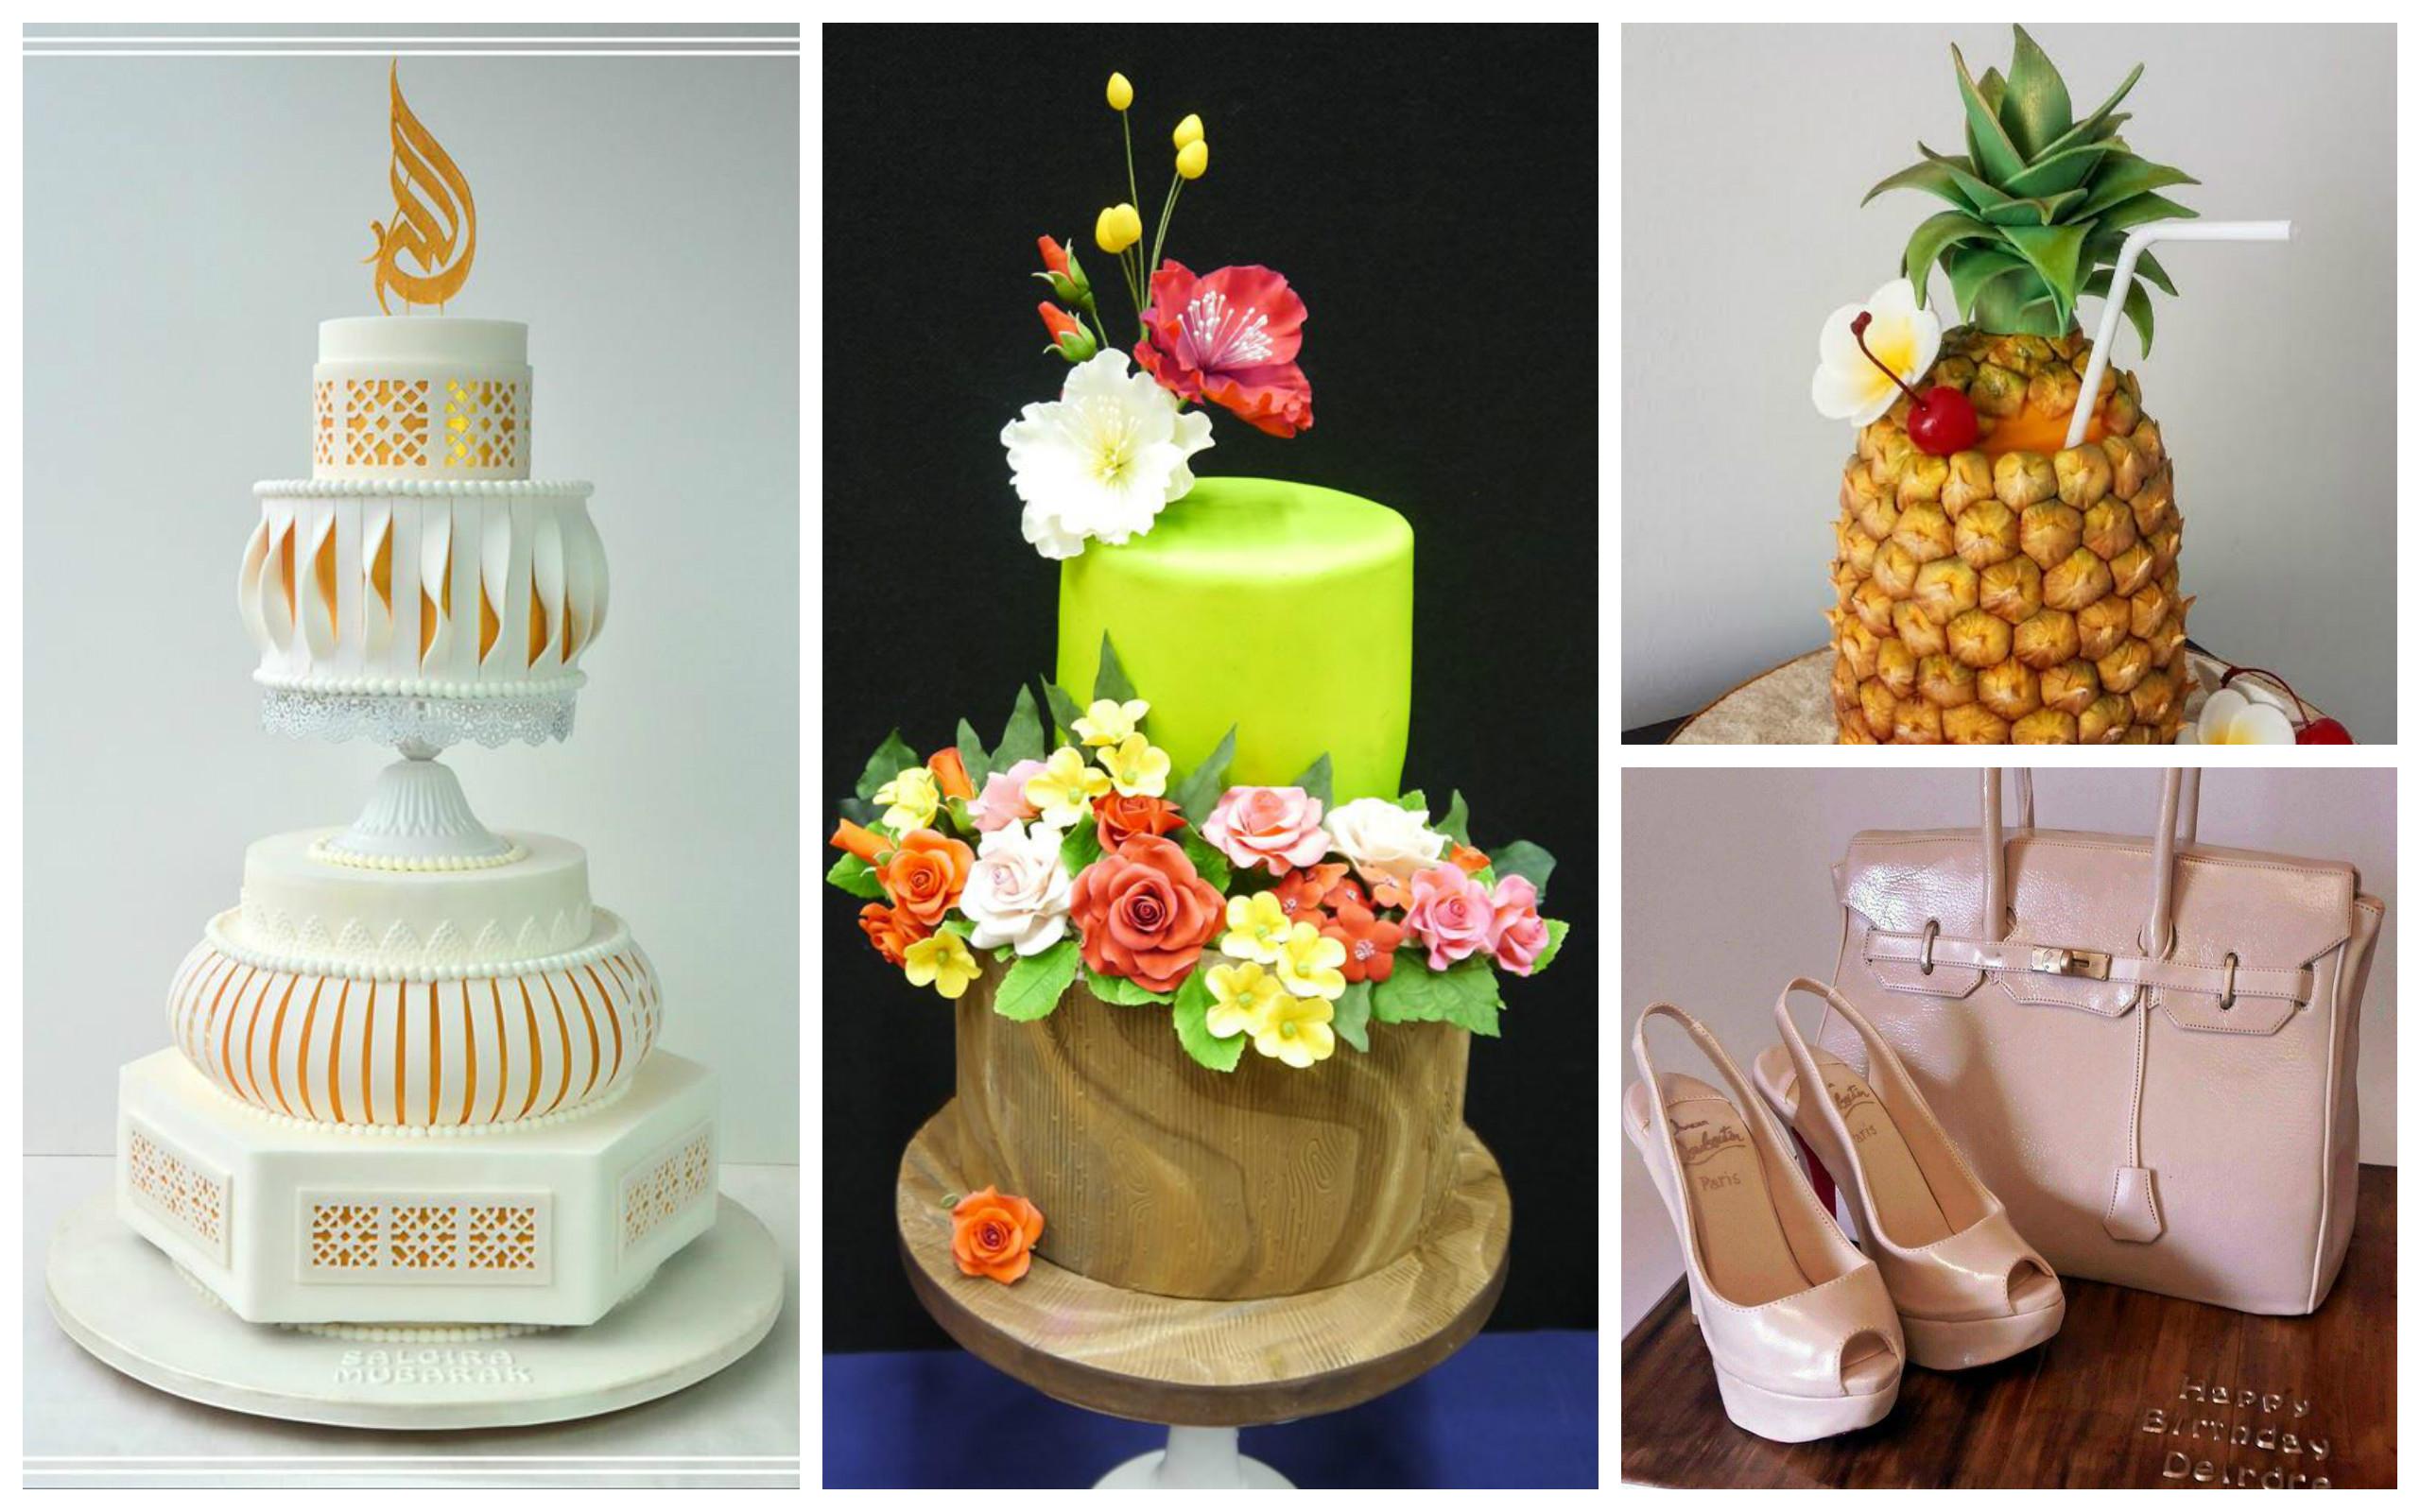 competition world famous cake decorator - Cake Decorator